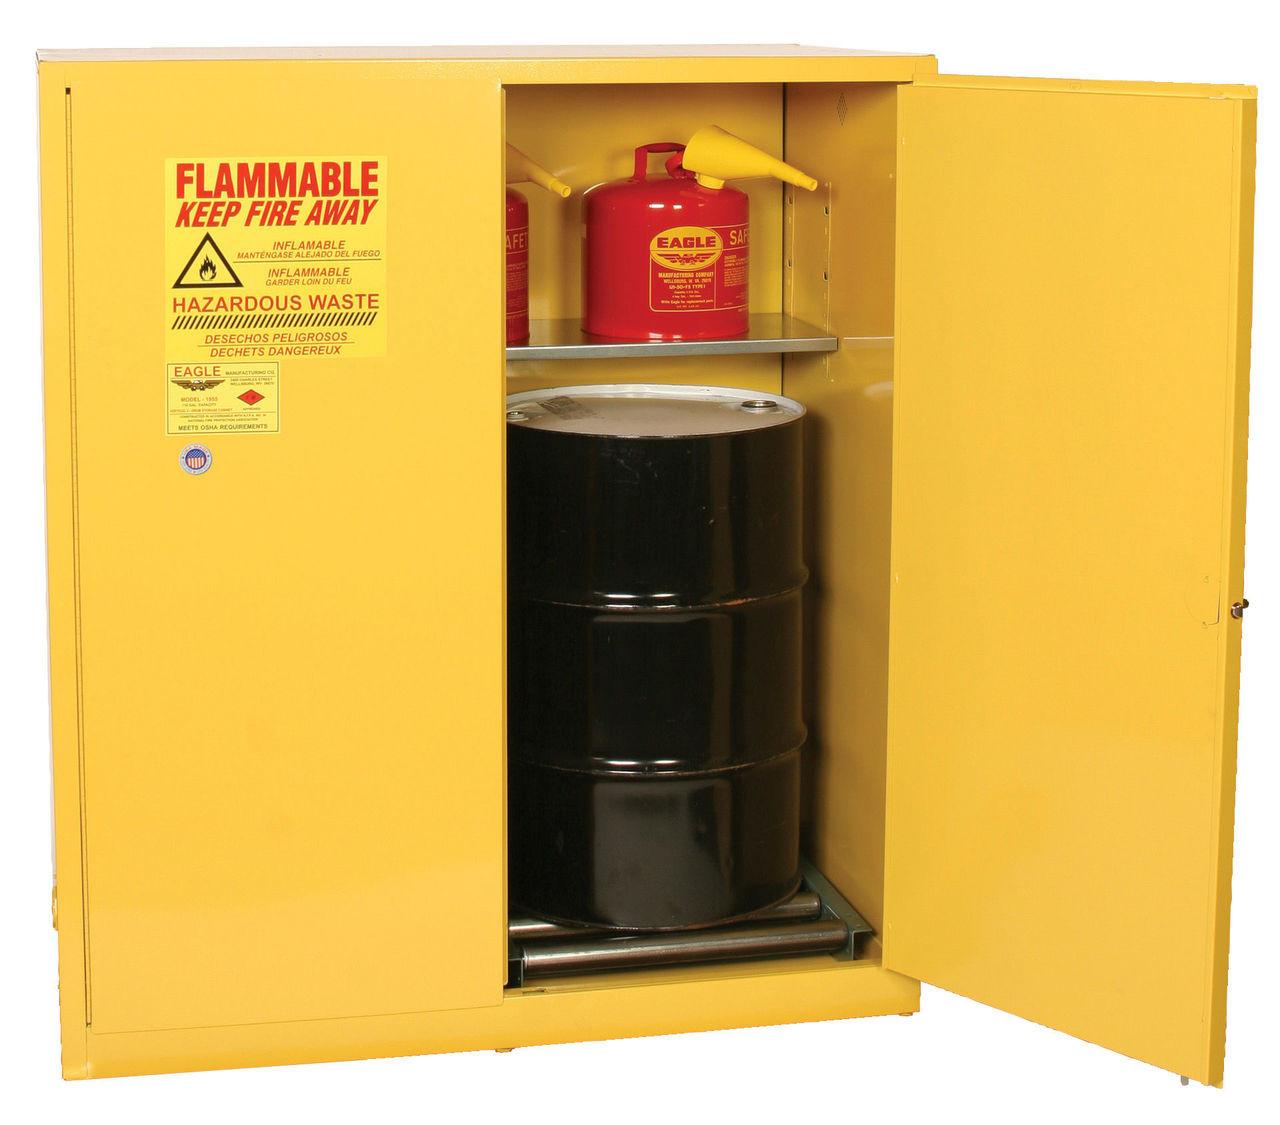 & Eagle HazMat Drum Storage Cabinet 110 Gallons Self Closing